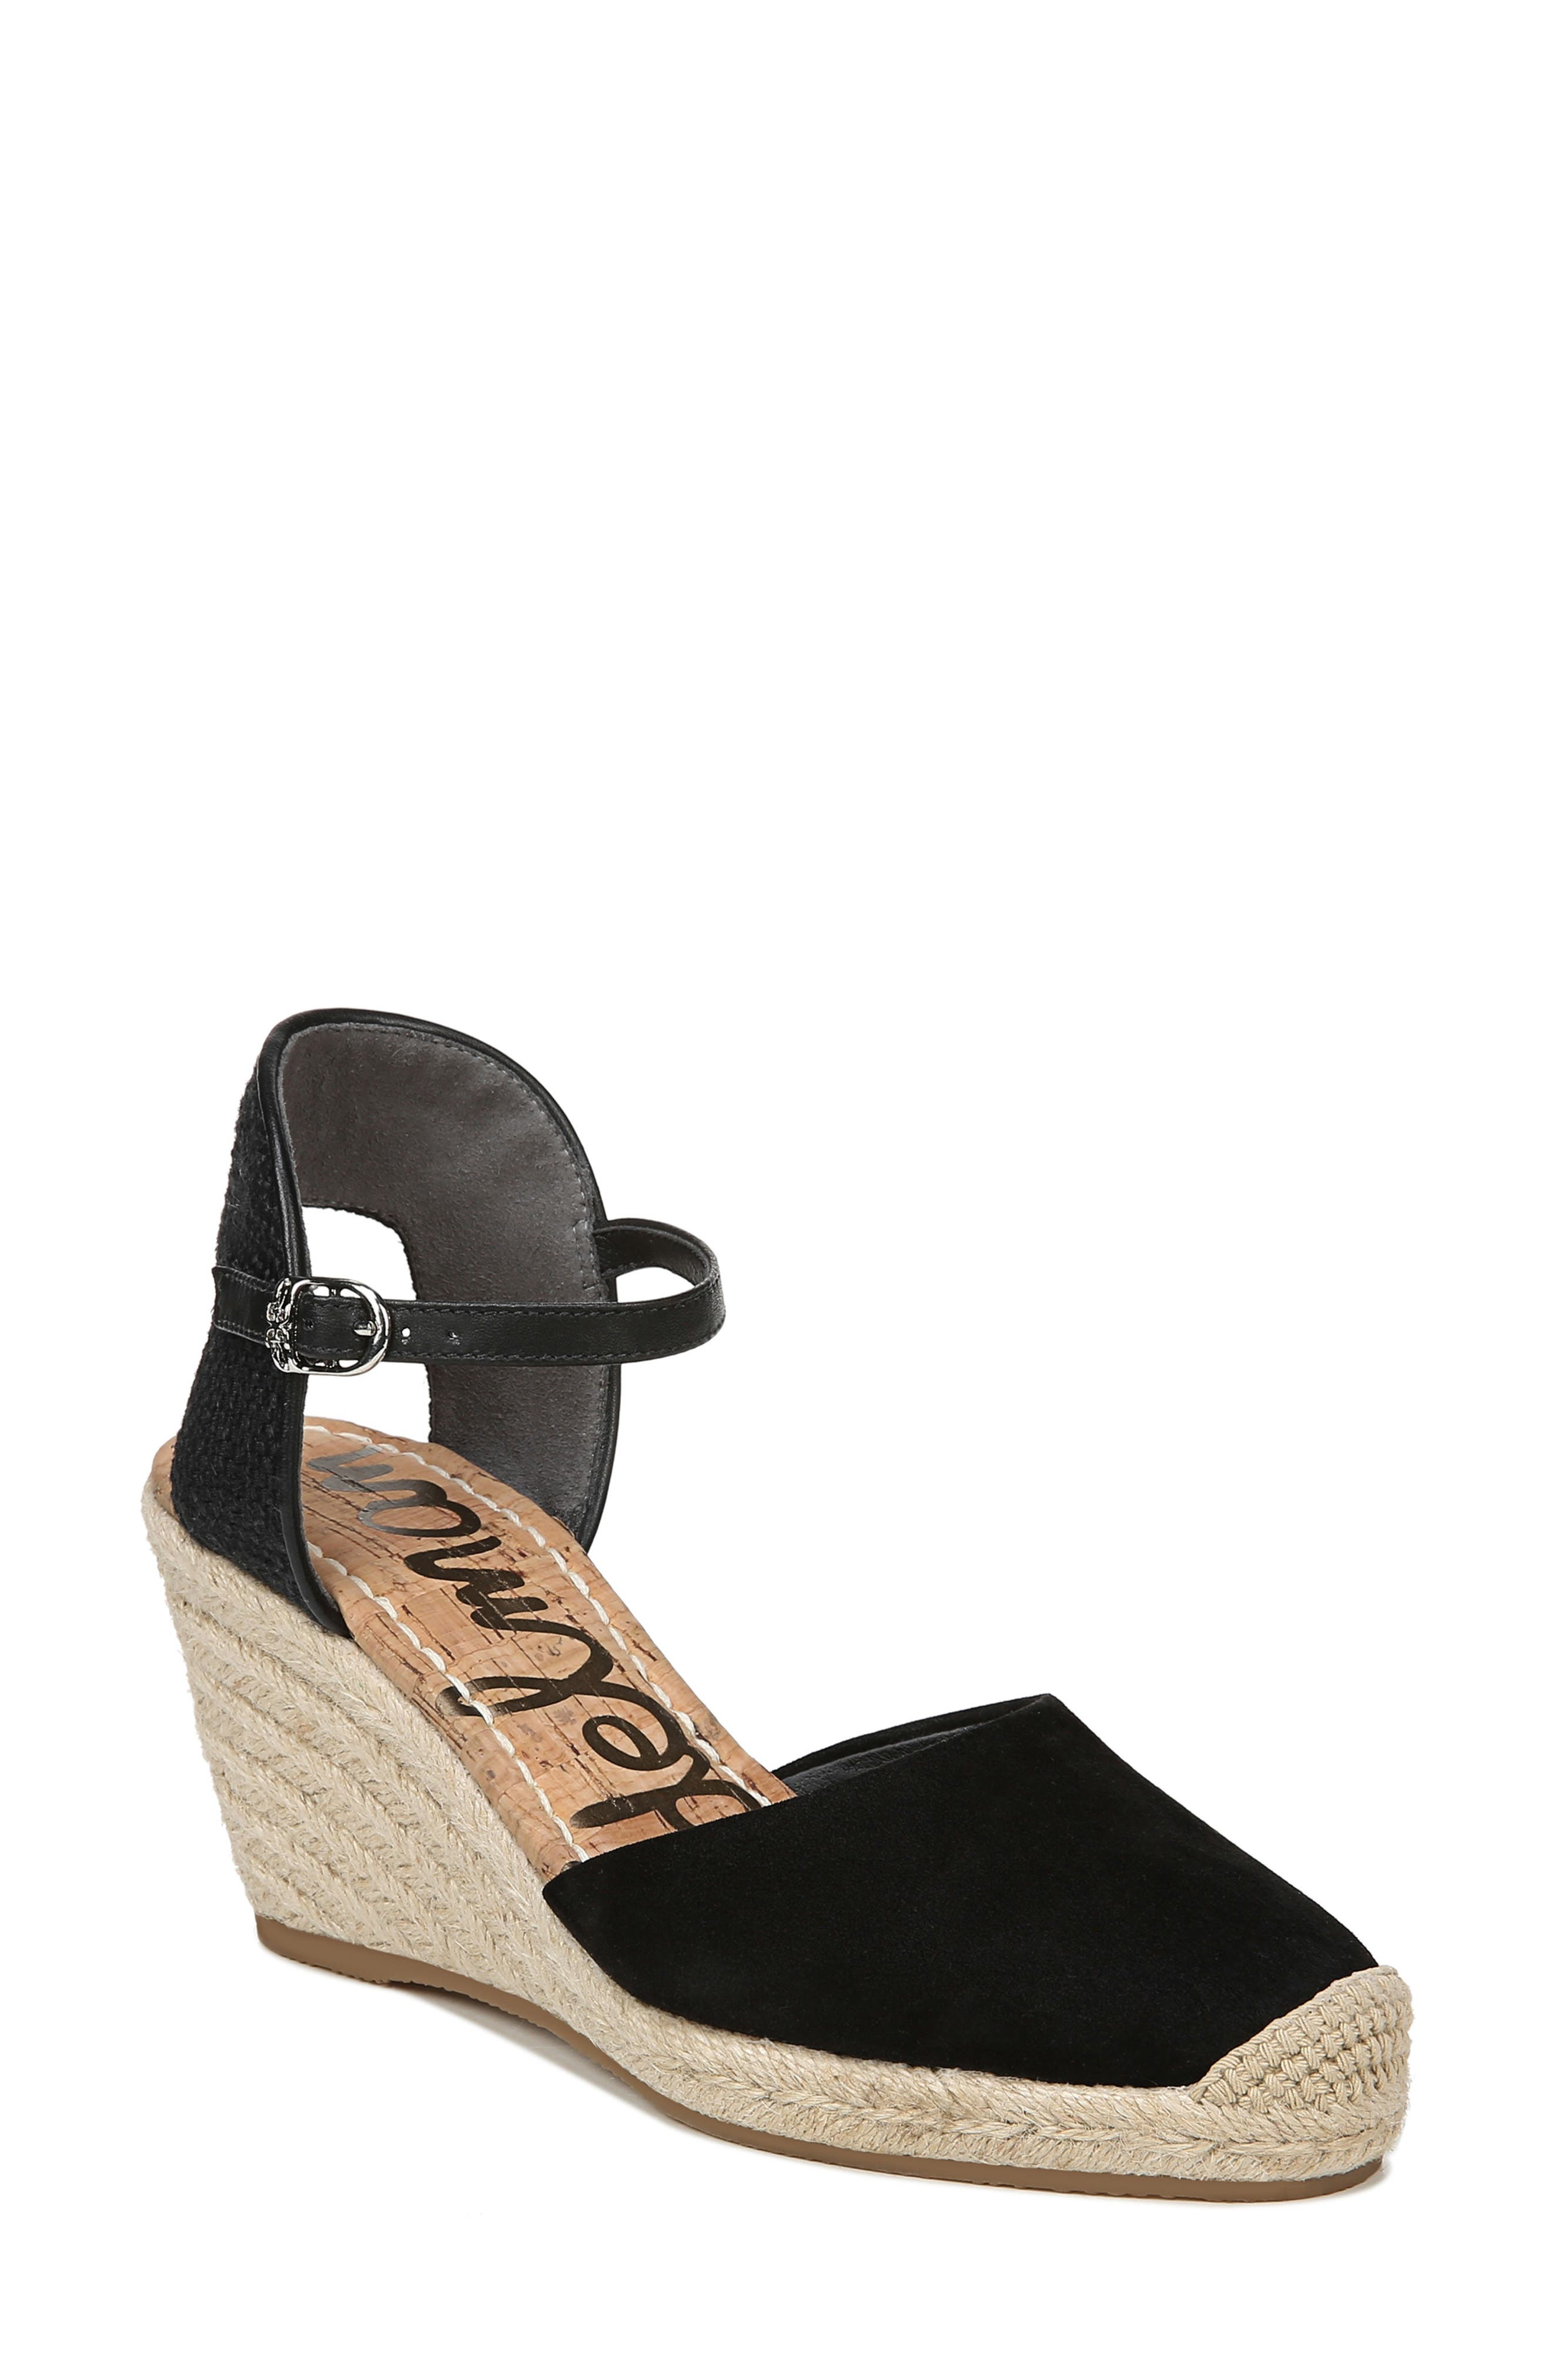 SAM EDELMAN Payton Wedge Sandal, Main, color, BLACK